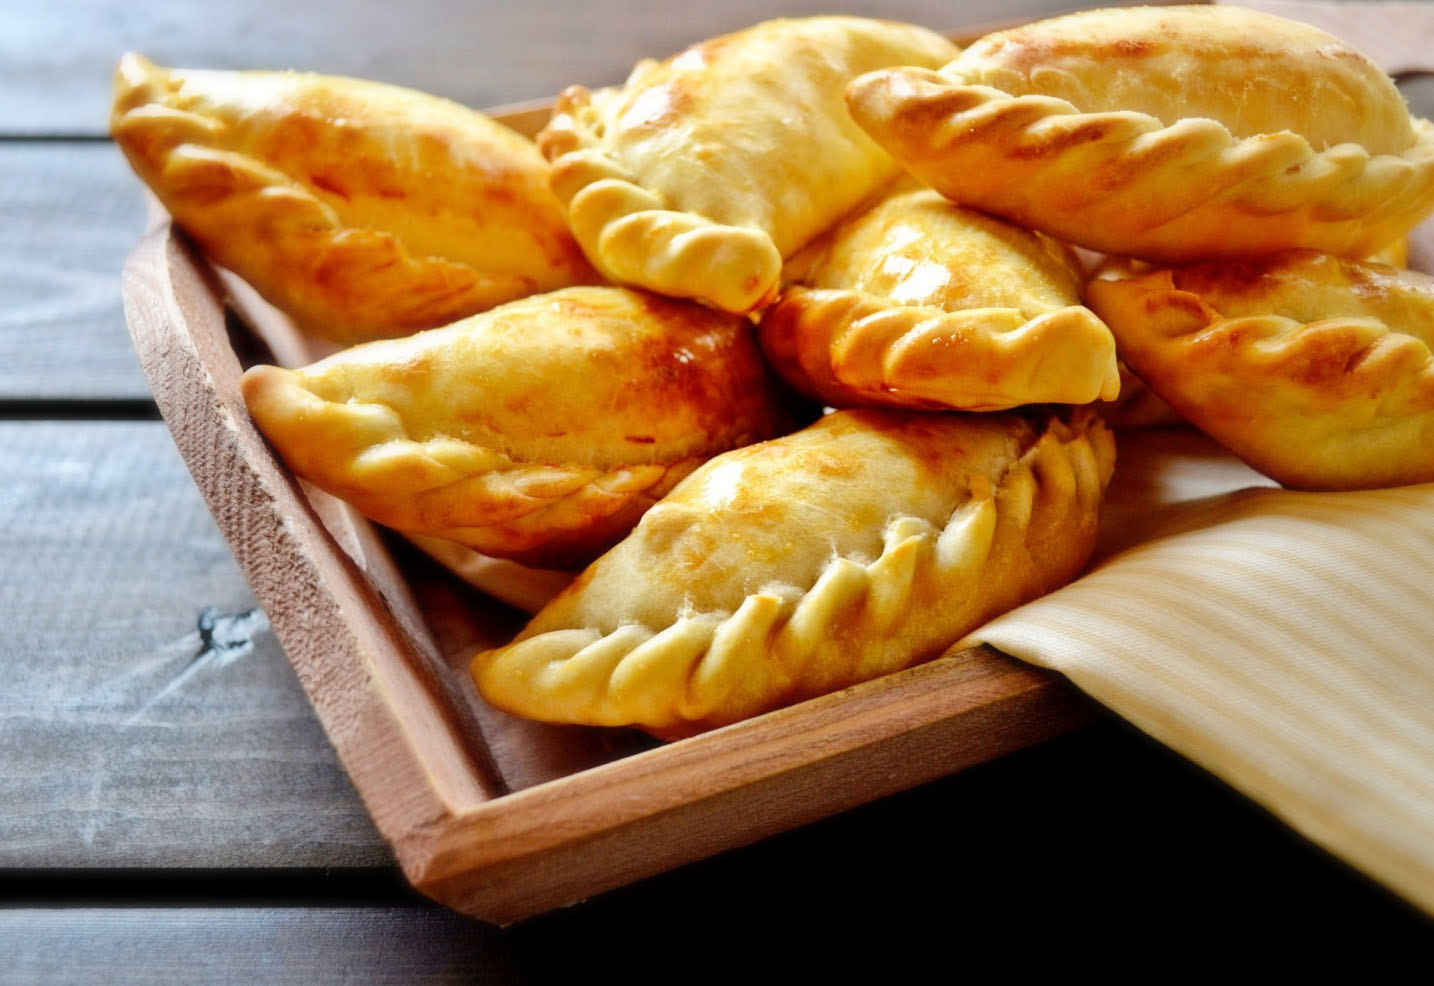 Food from the World: Empanada